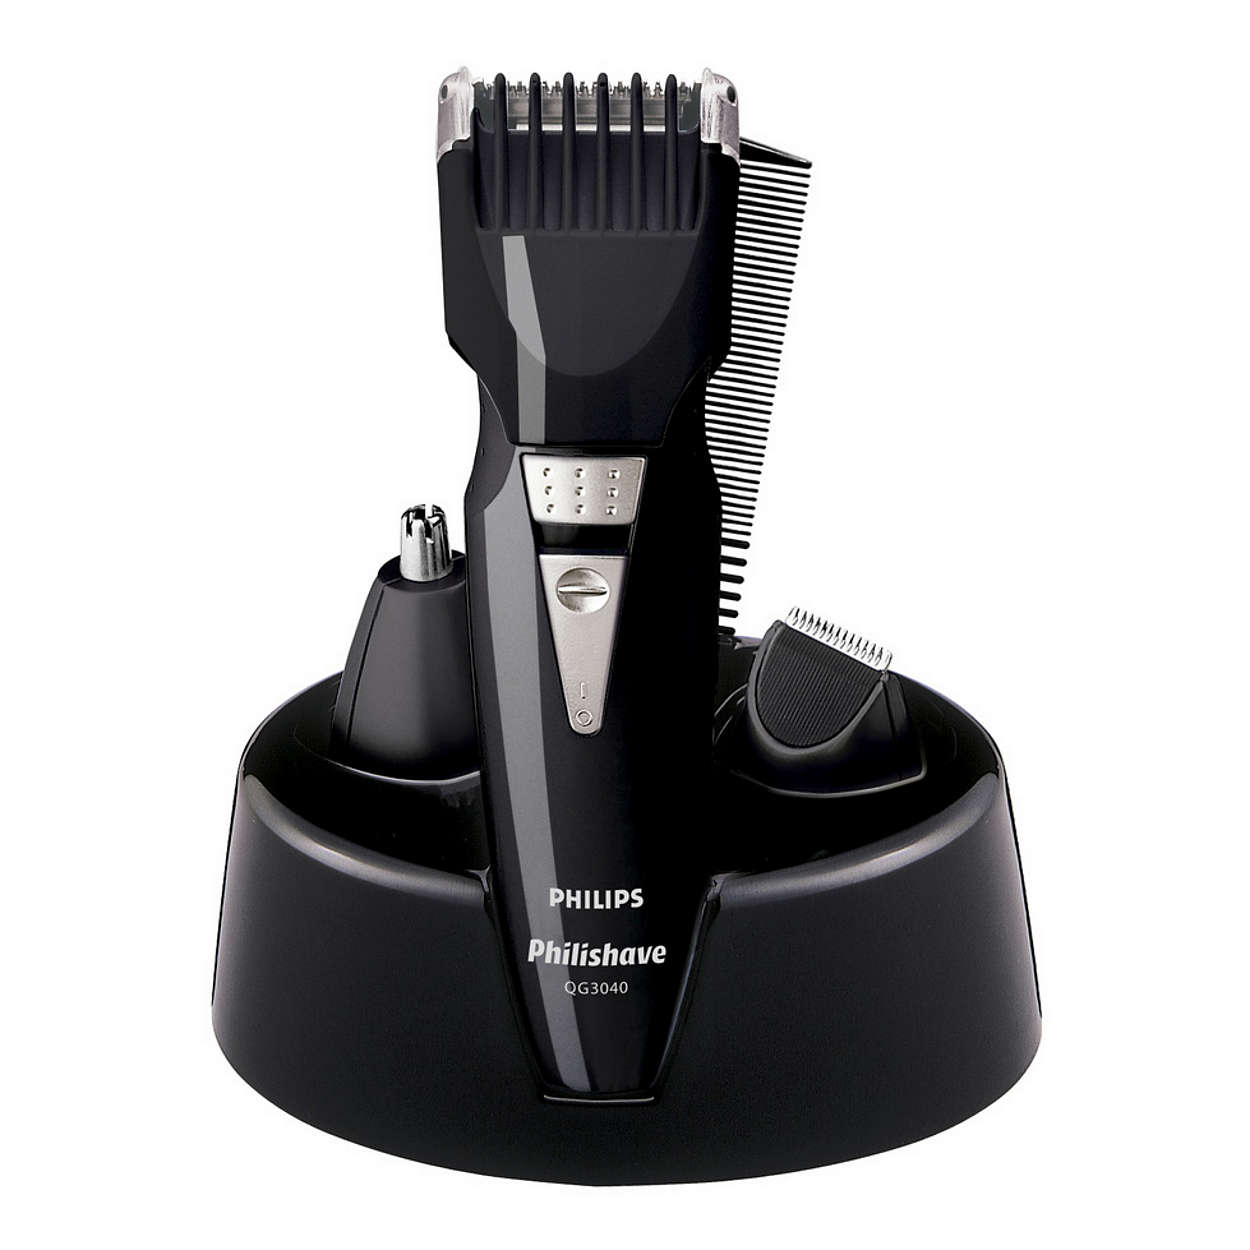 5-i-1 grooming kit